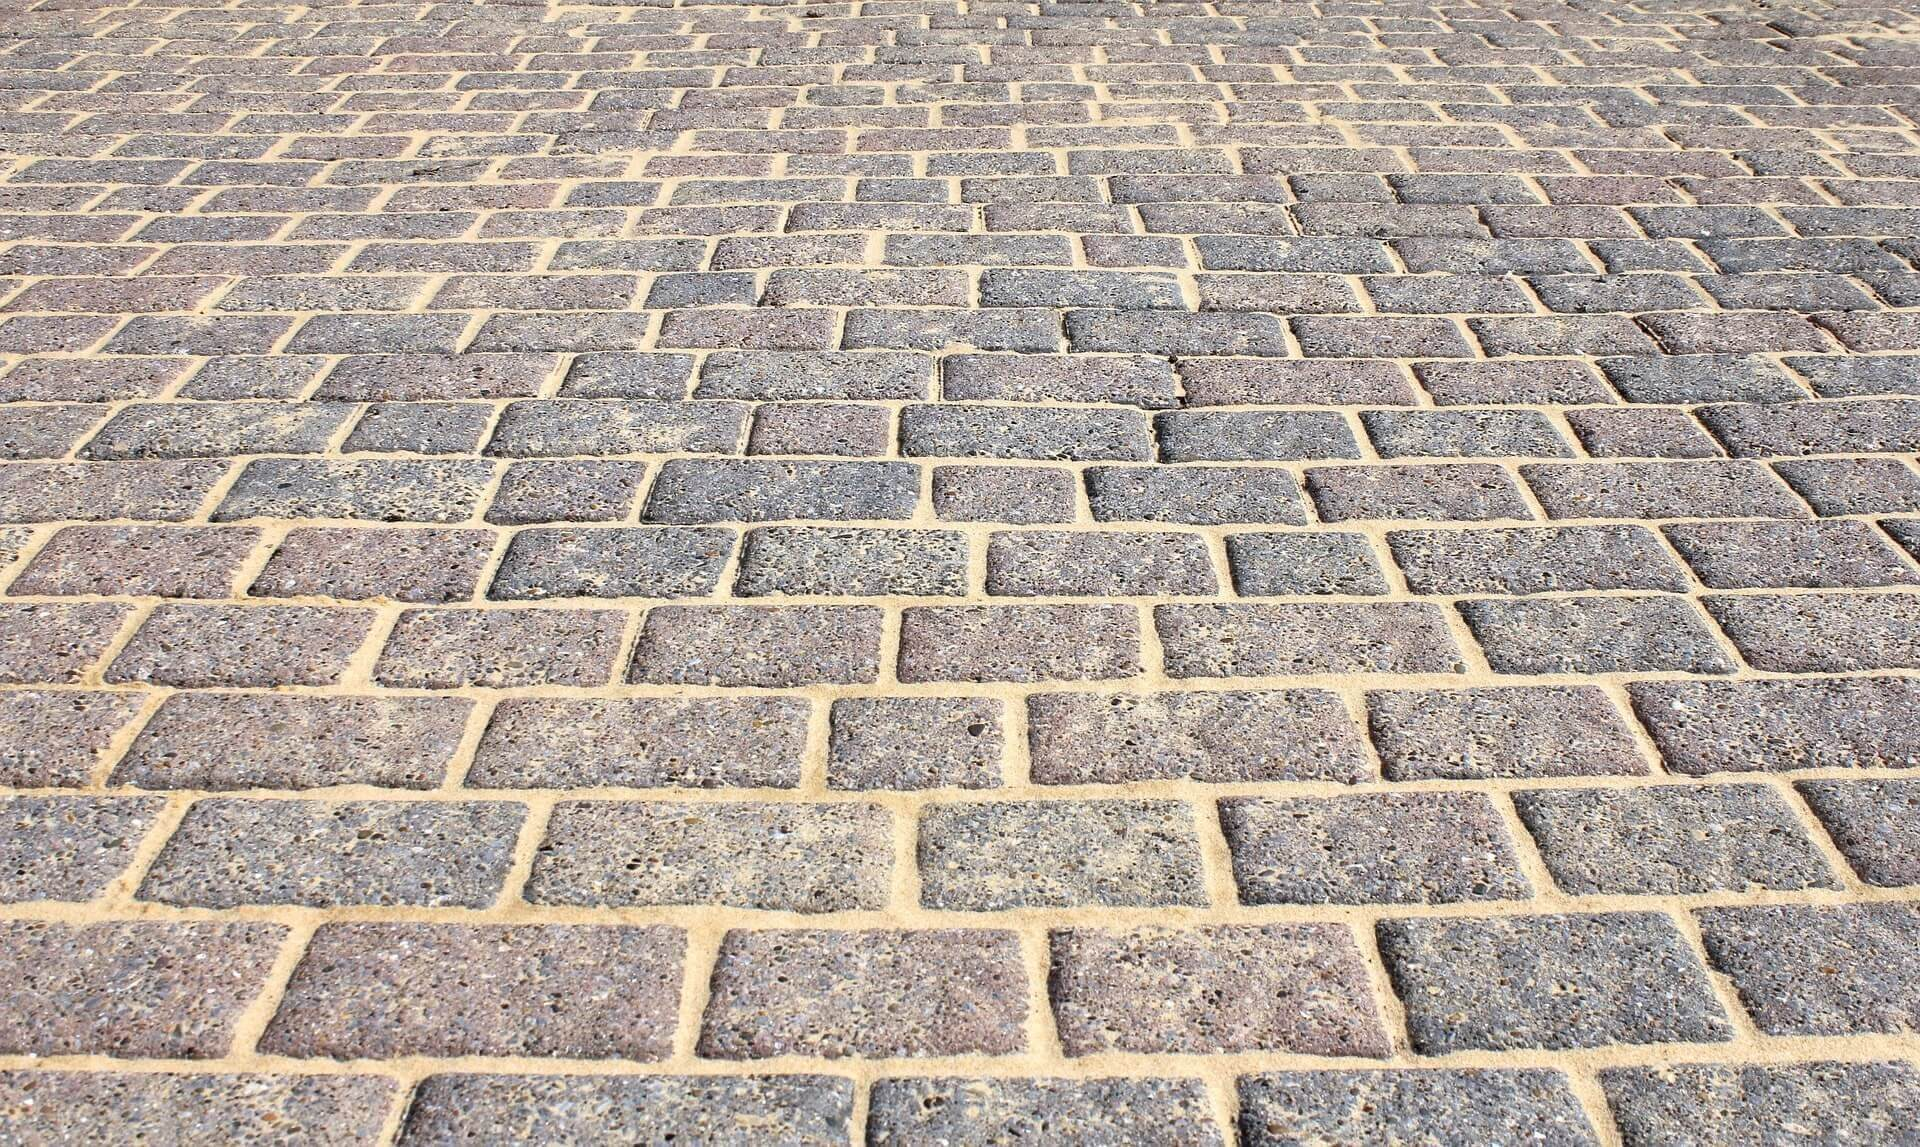 Patio Laying: Image of a block paved driveway.